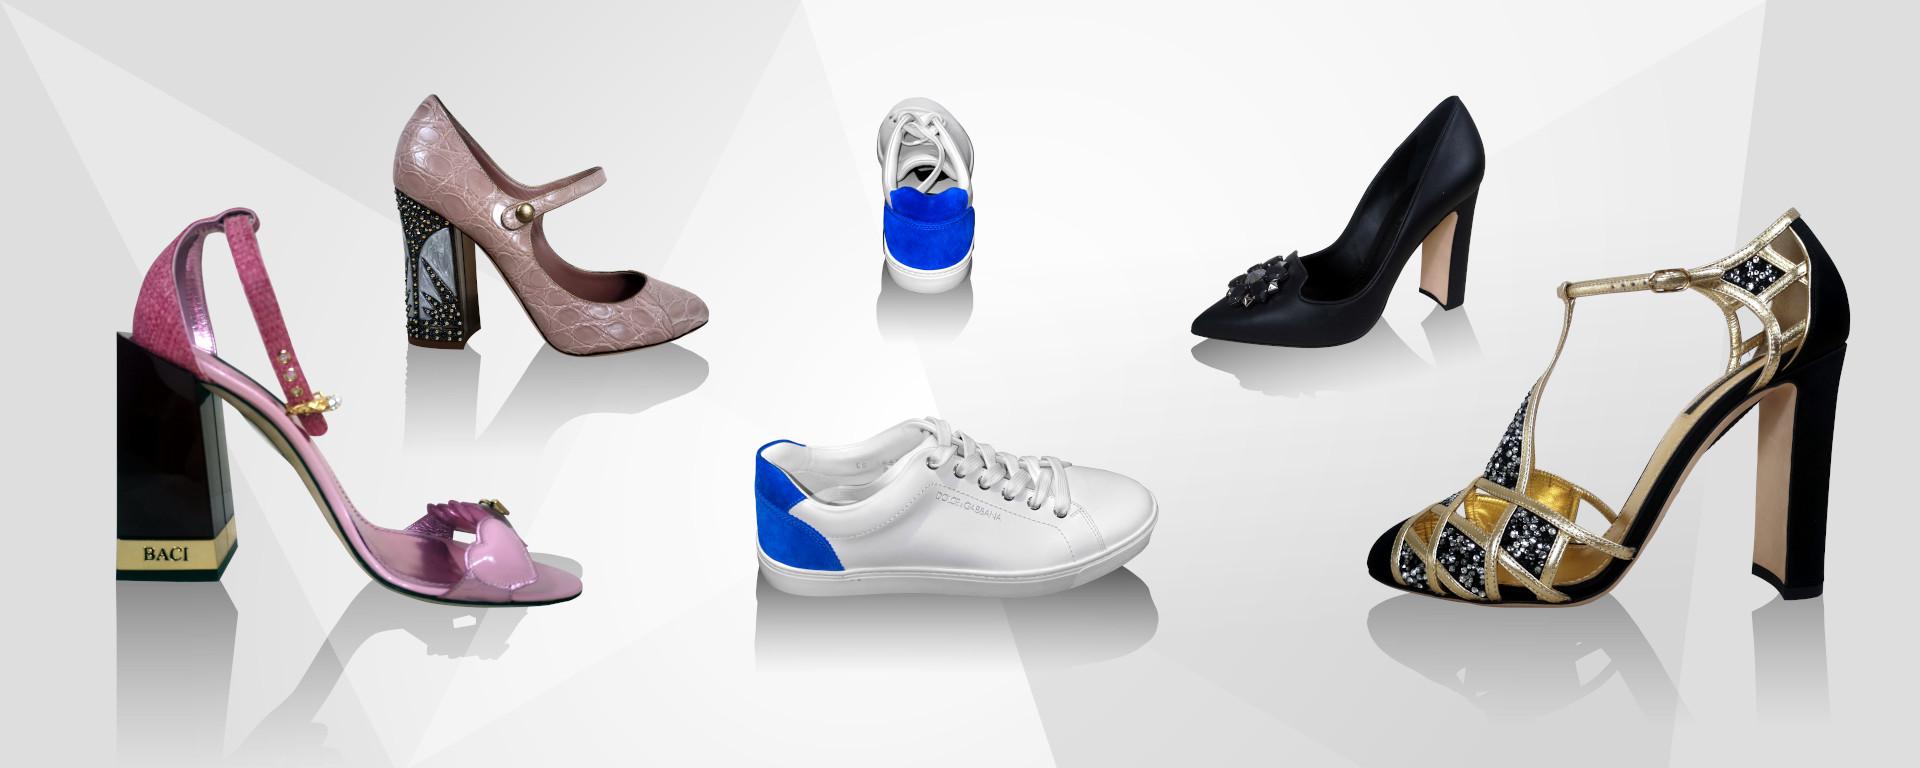 Kategoriebild Schuhe & Stiefel